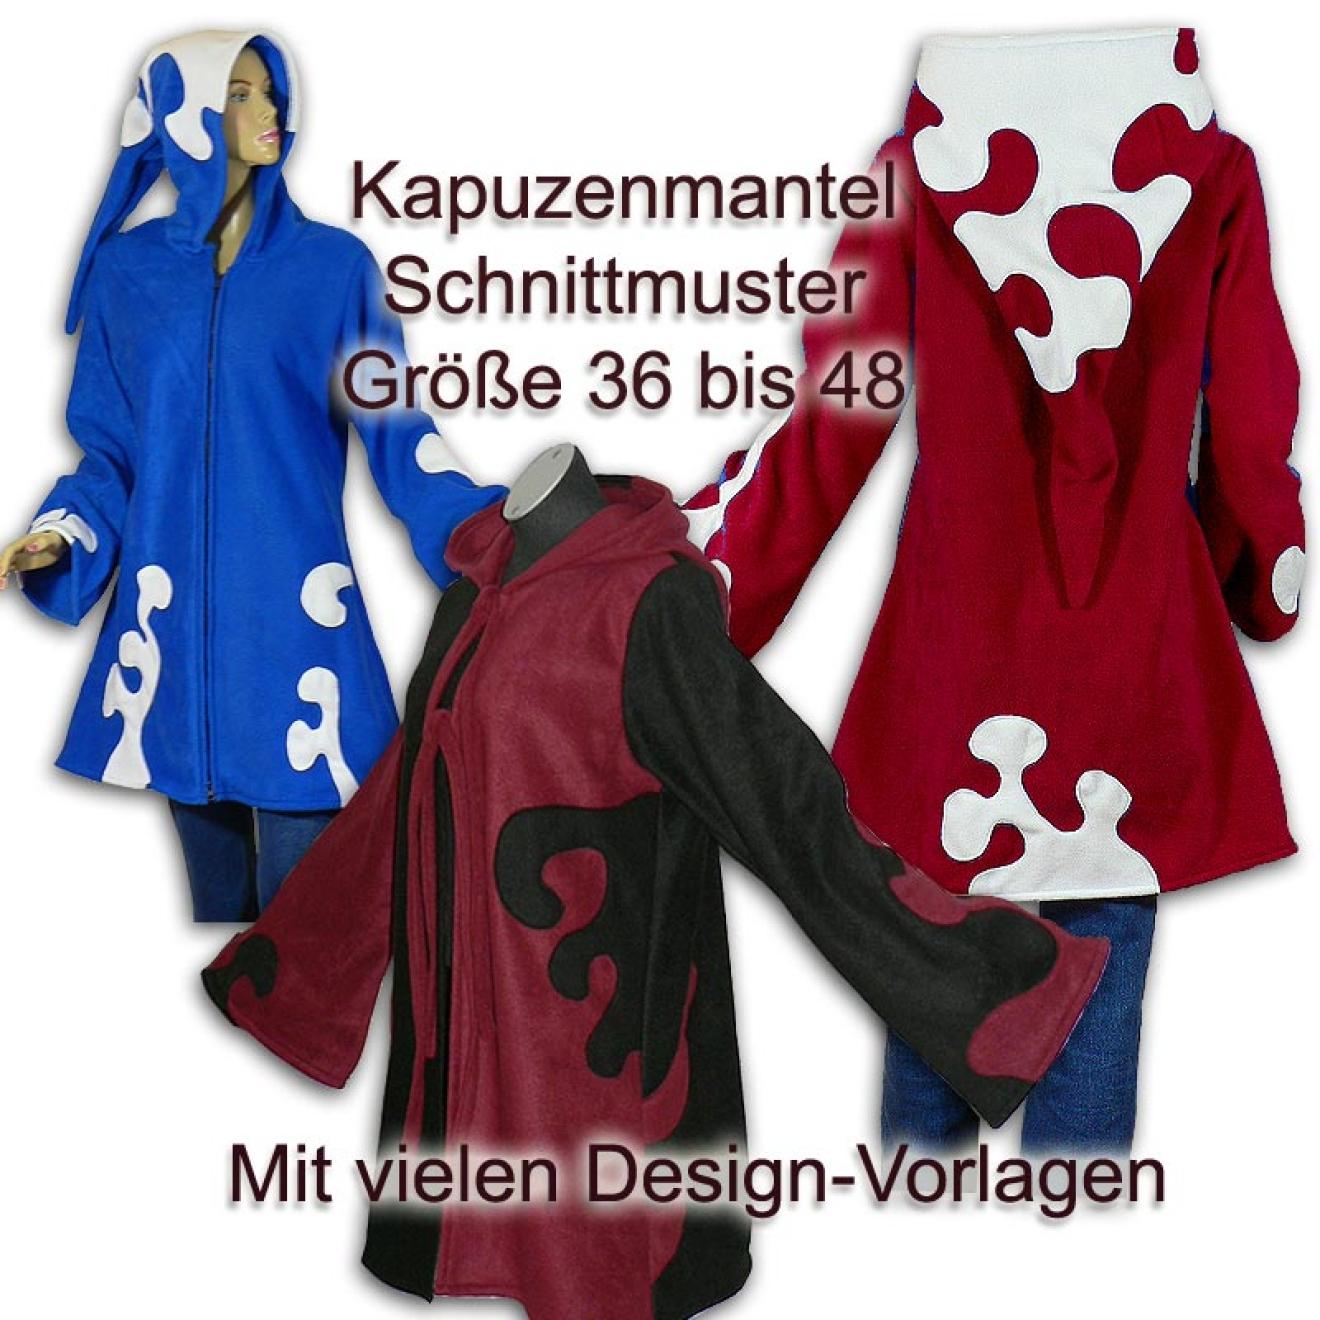 Schnittmuster e-book Elfenmantel mit Applikationen